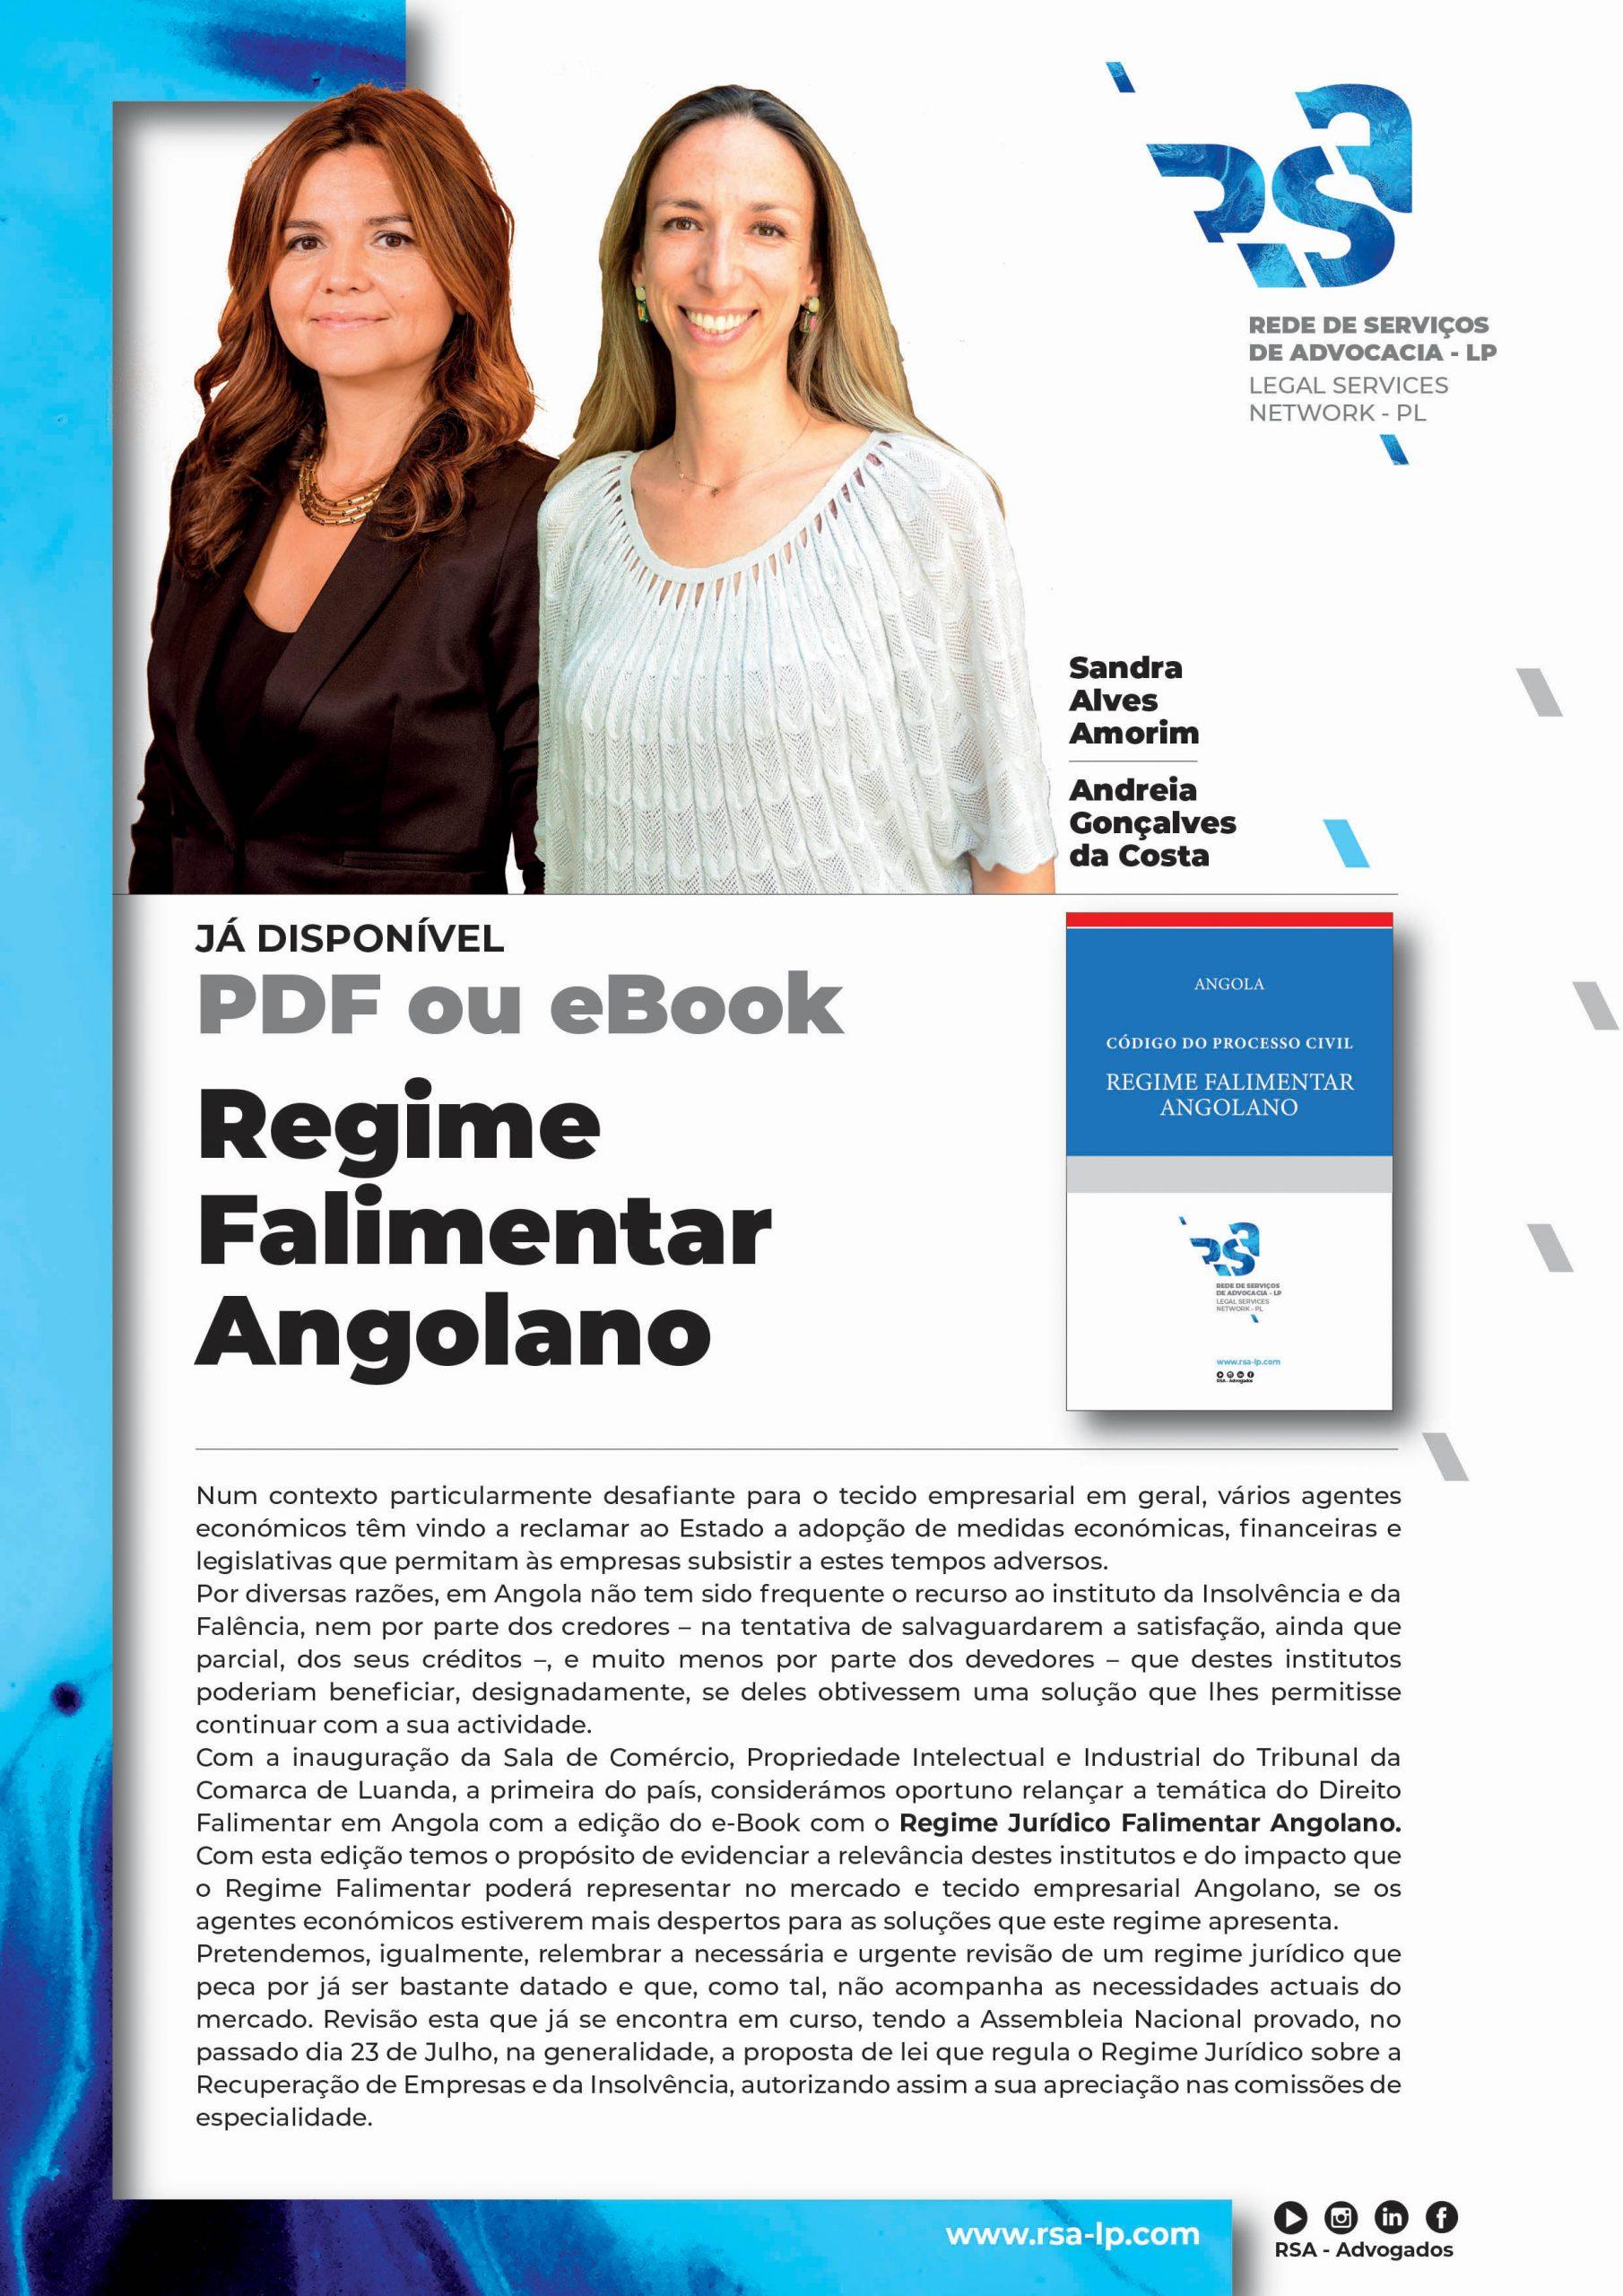 Ebook sobre Regime Falimentar em Angola